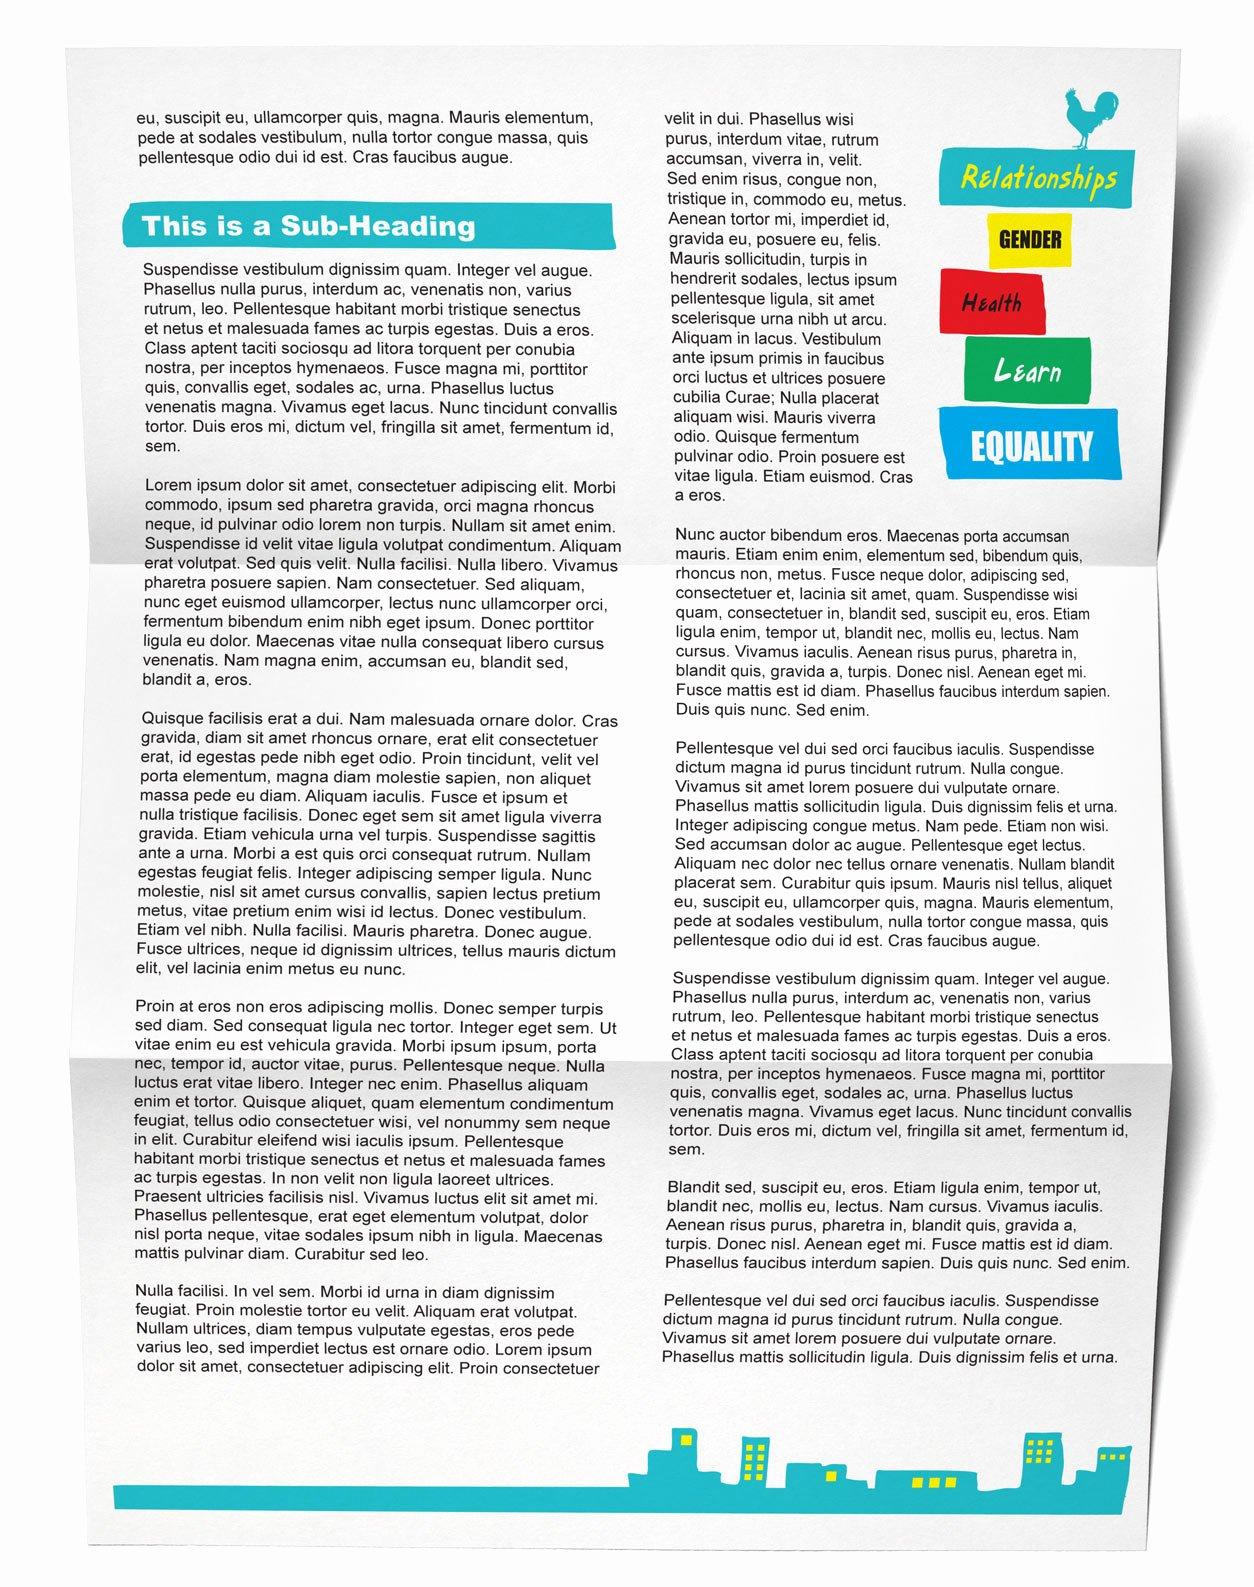 Policy Brief Template Microsoft Word Luxury Tinassiti